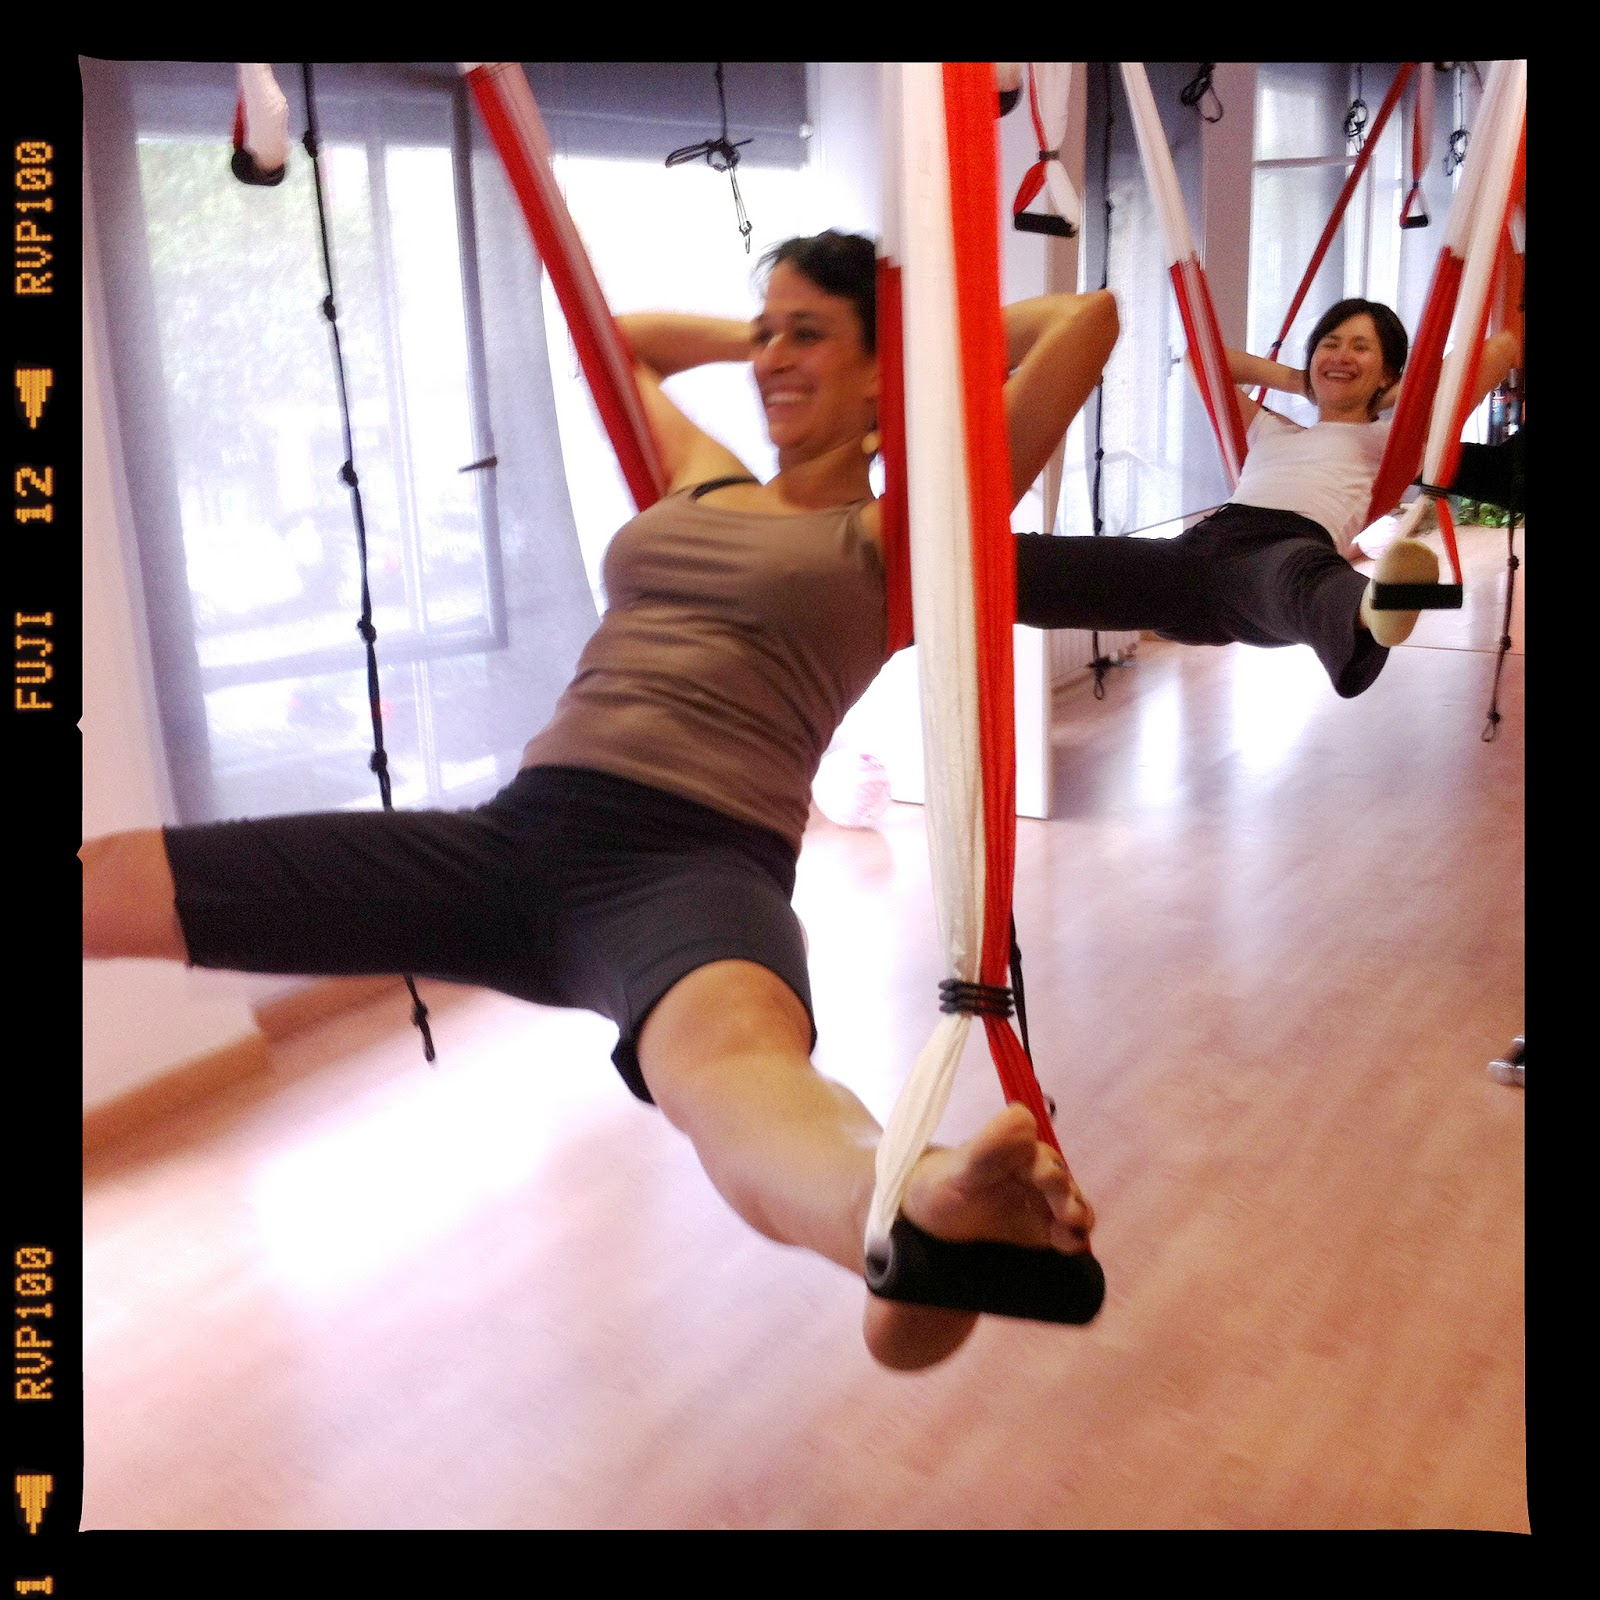 ayurveda yoga aereo anti age aerial pilates wellnesss